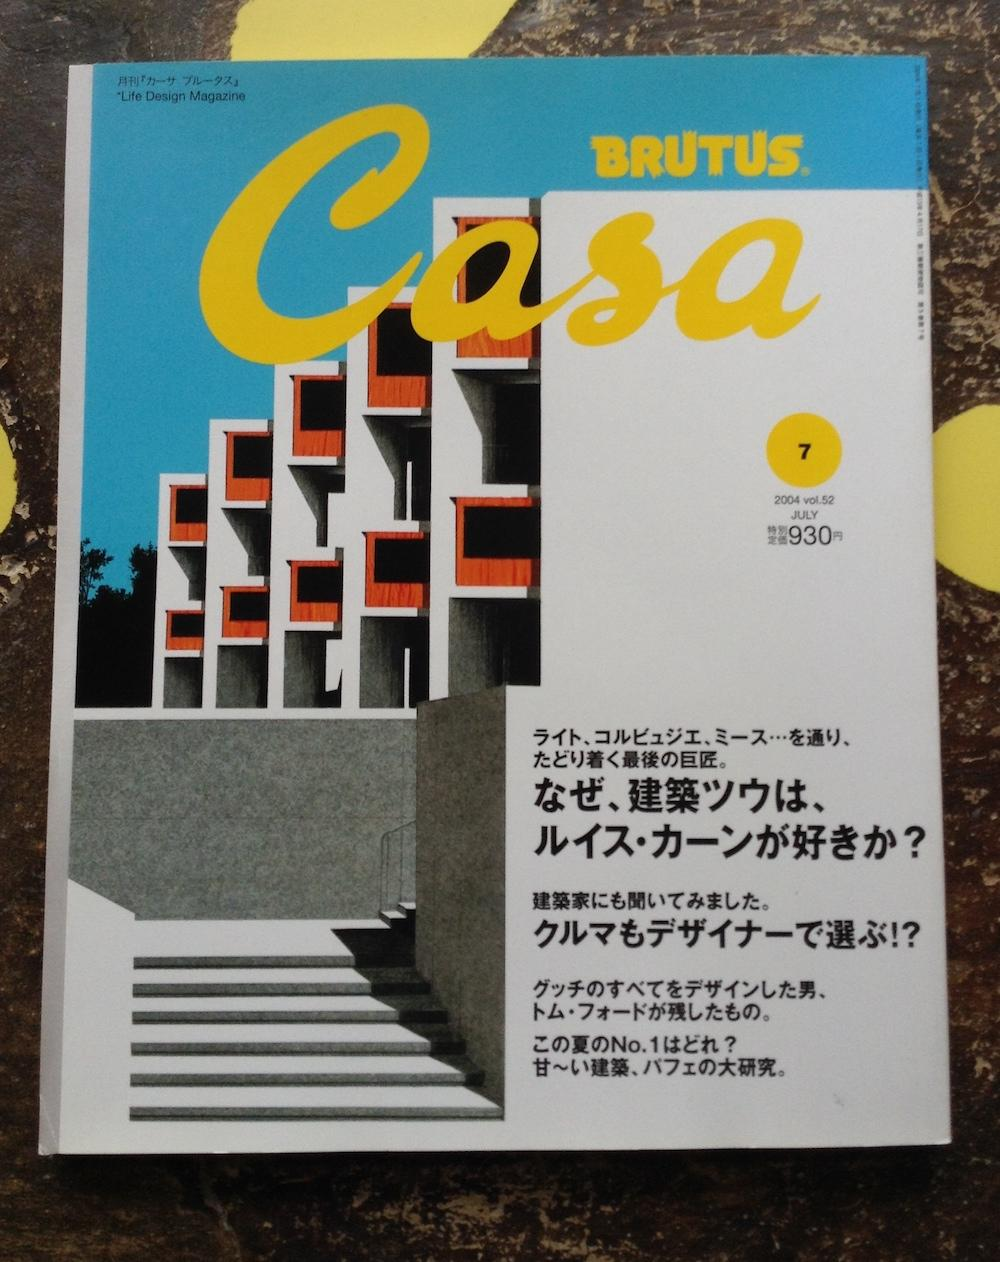 Casa brutus 52